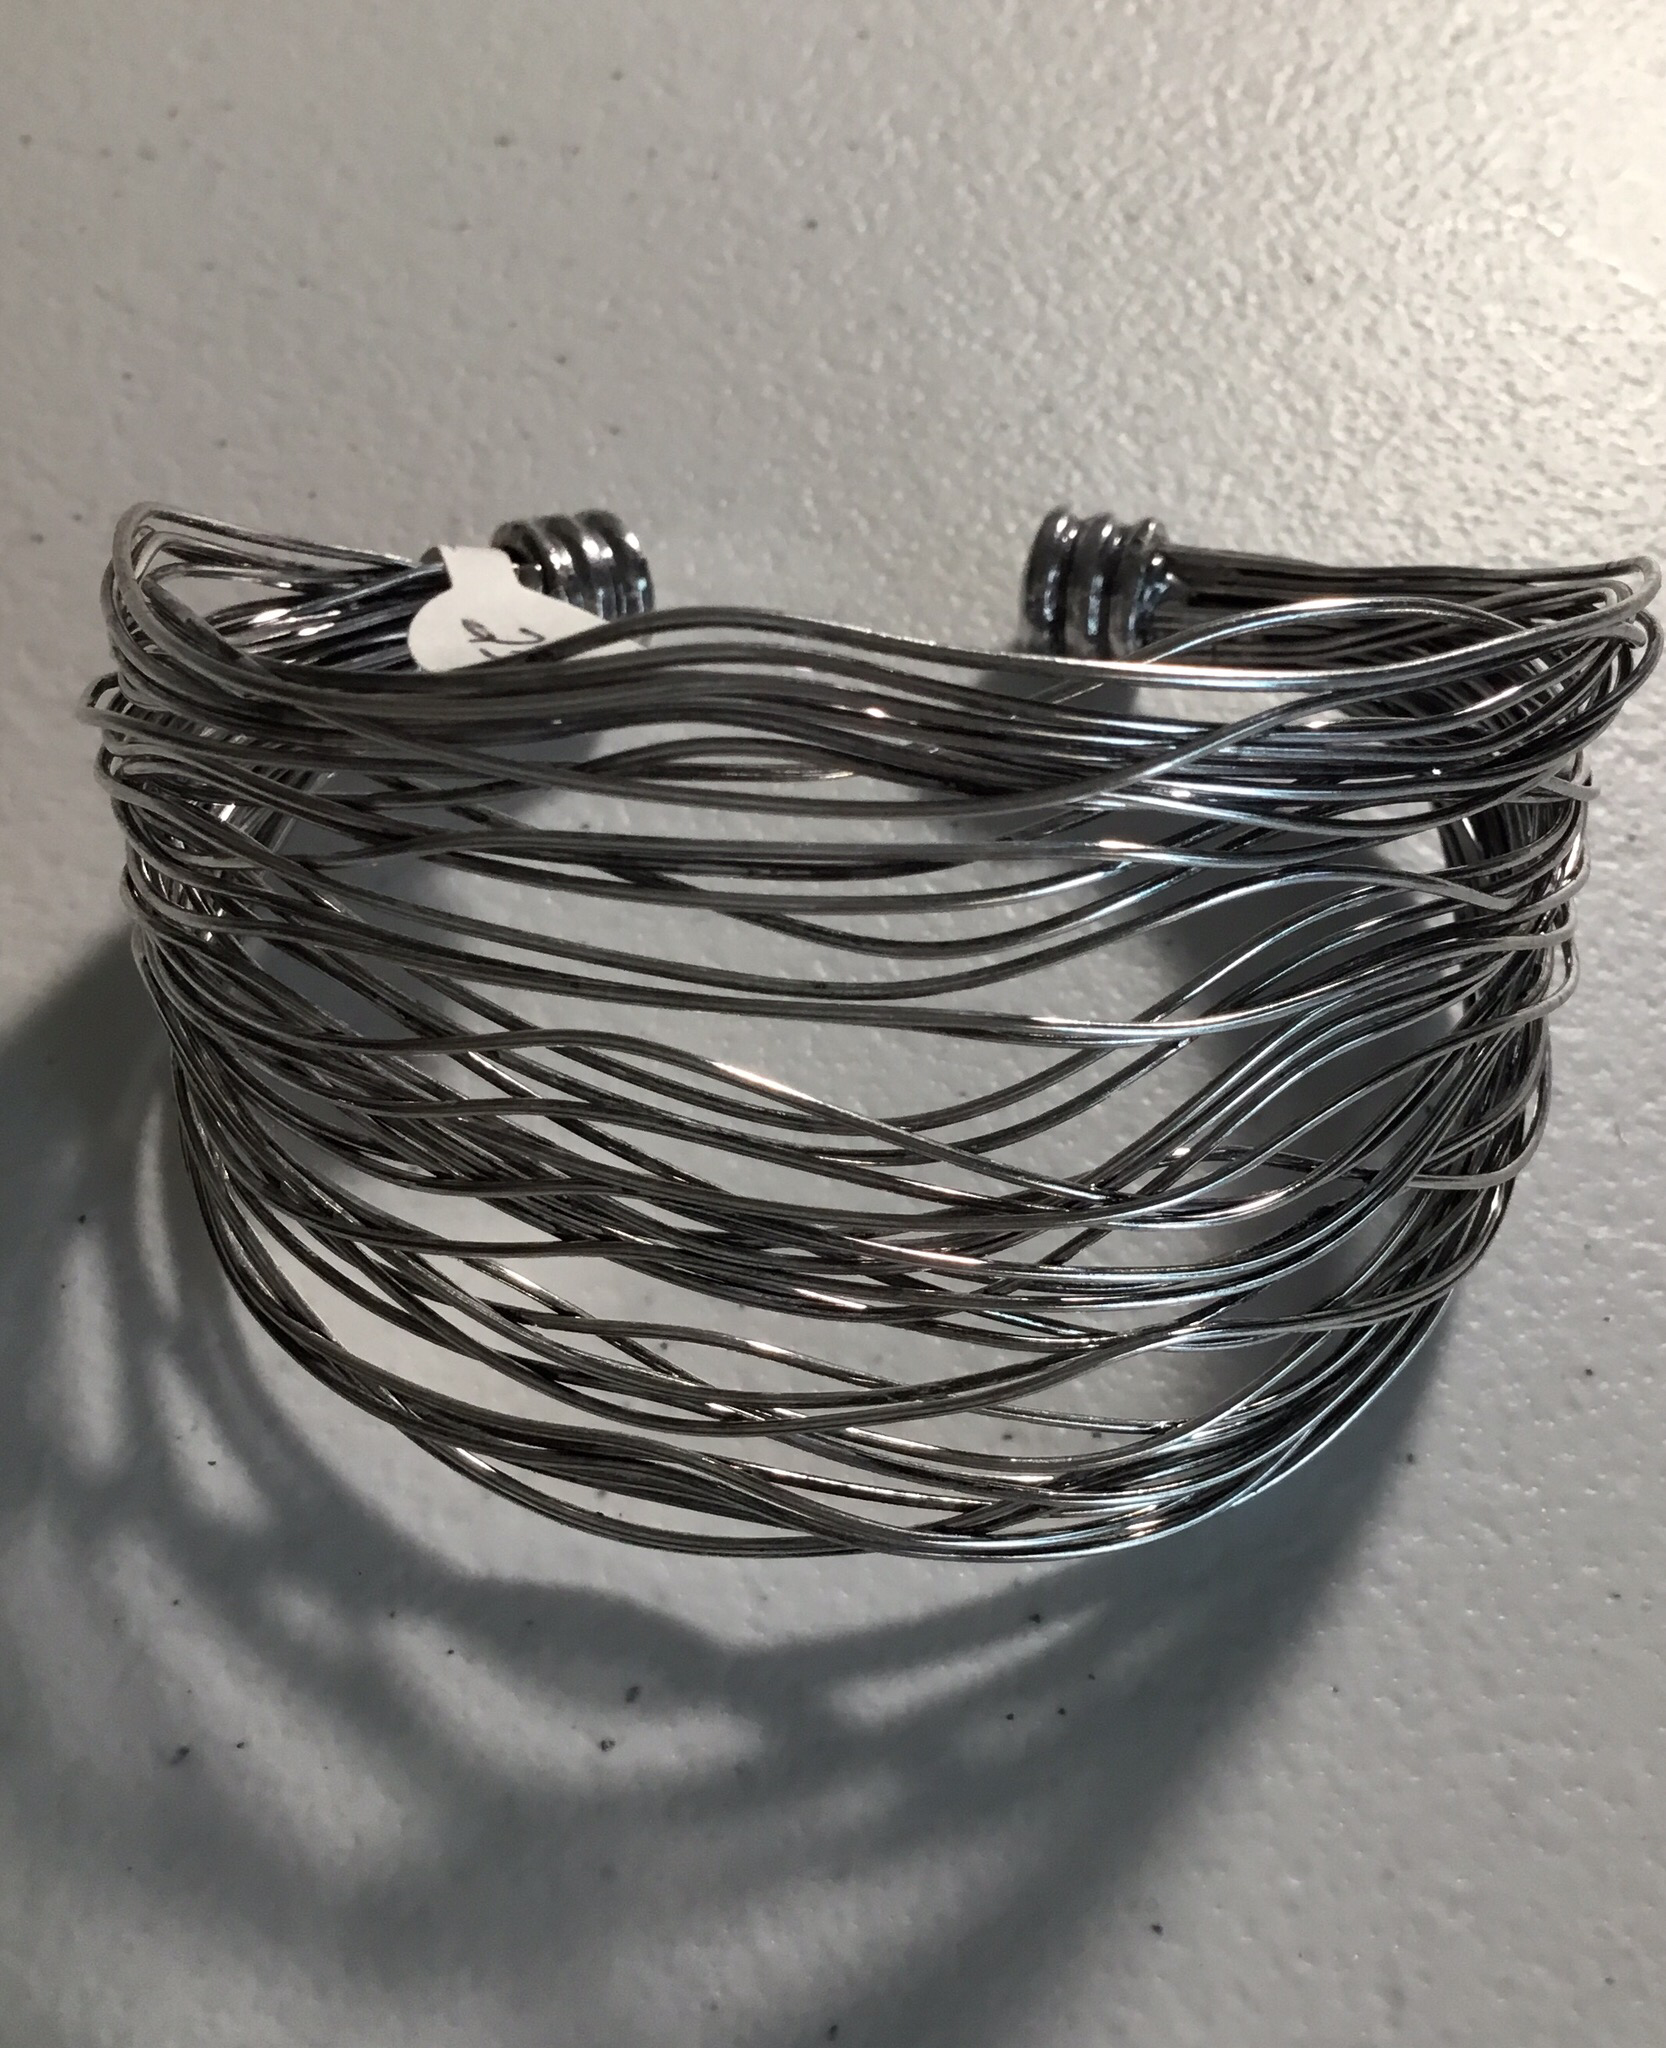 Silver Wire Cuff JBR-023-6324